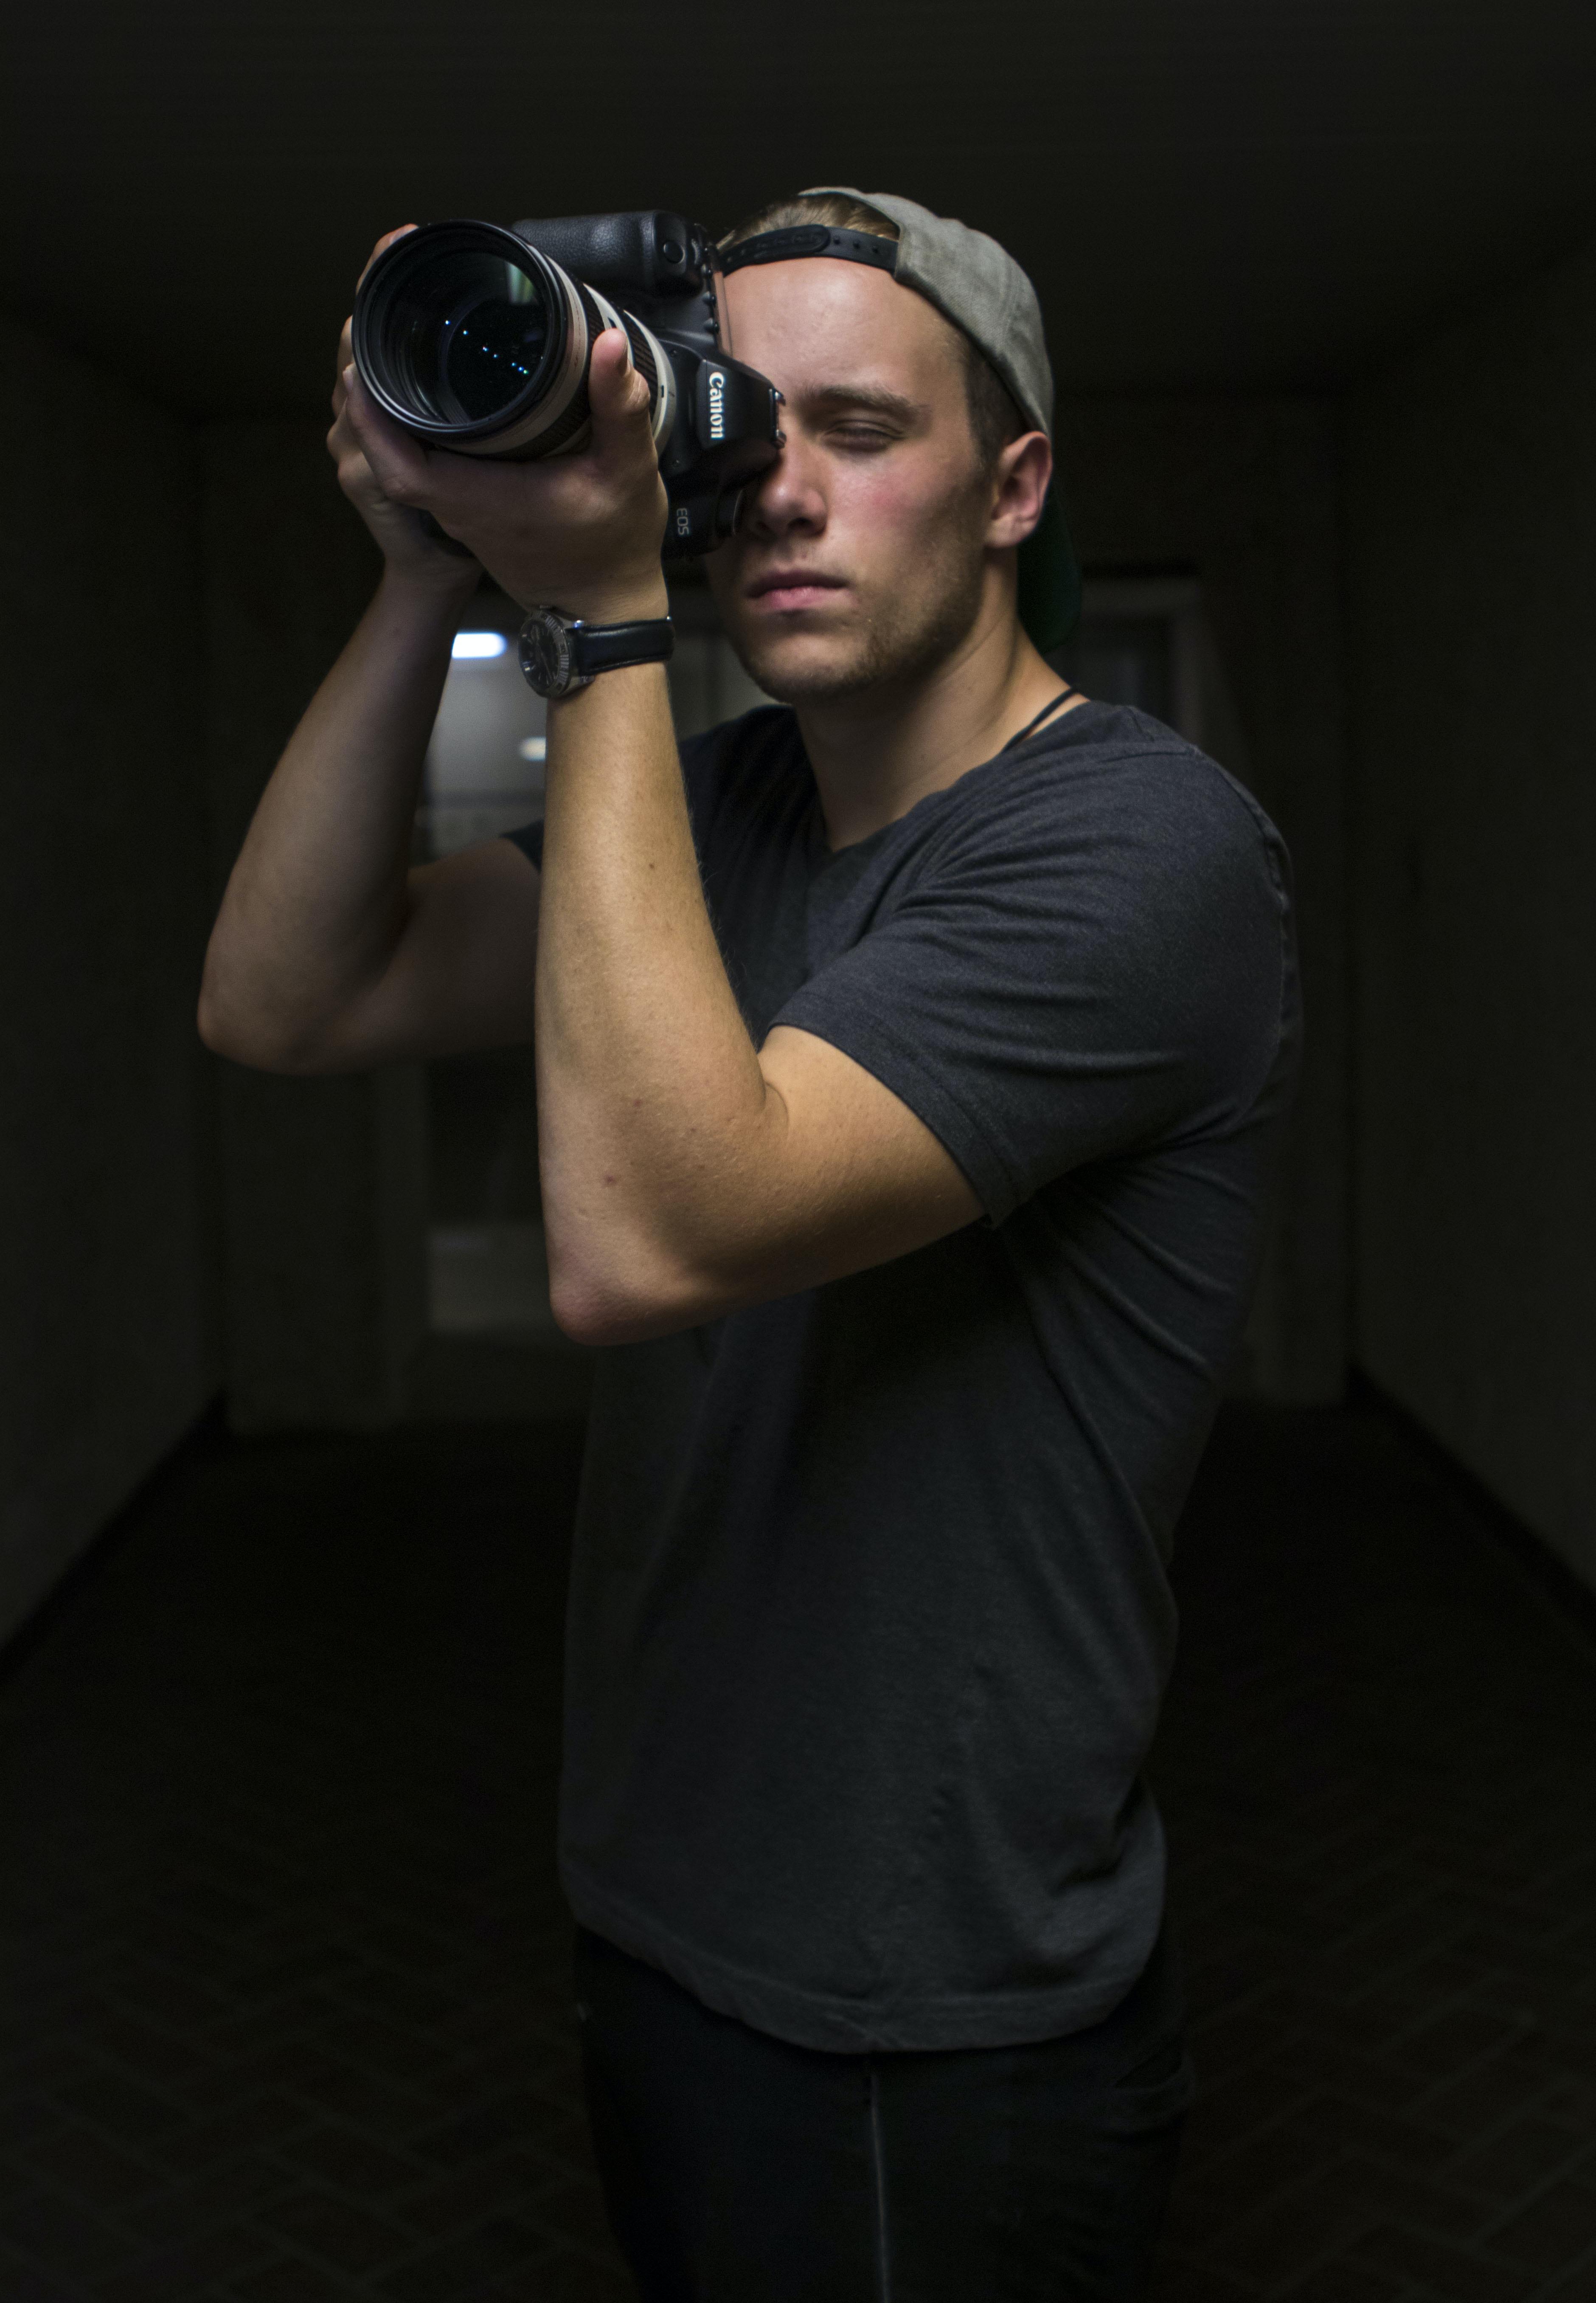 man taking photo using Canon DSLR camera